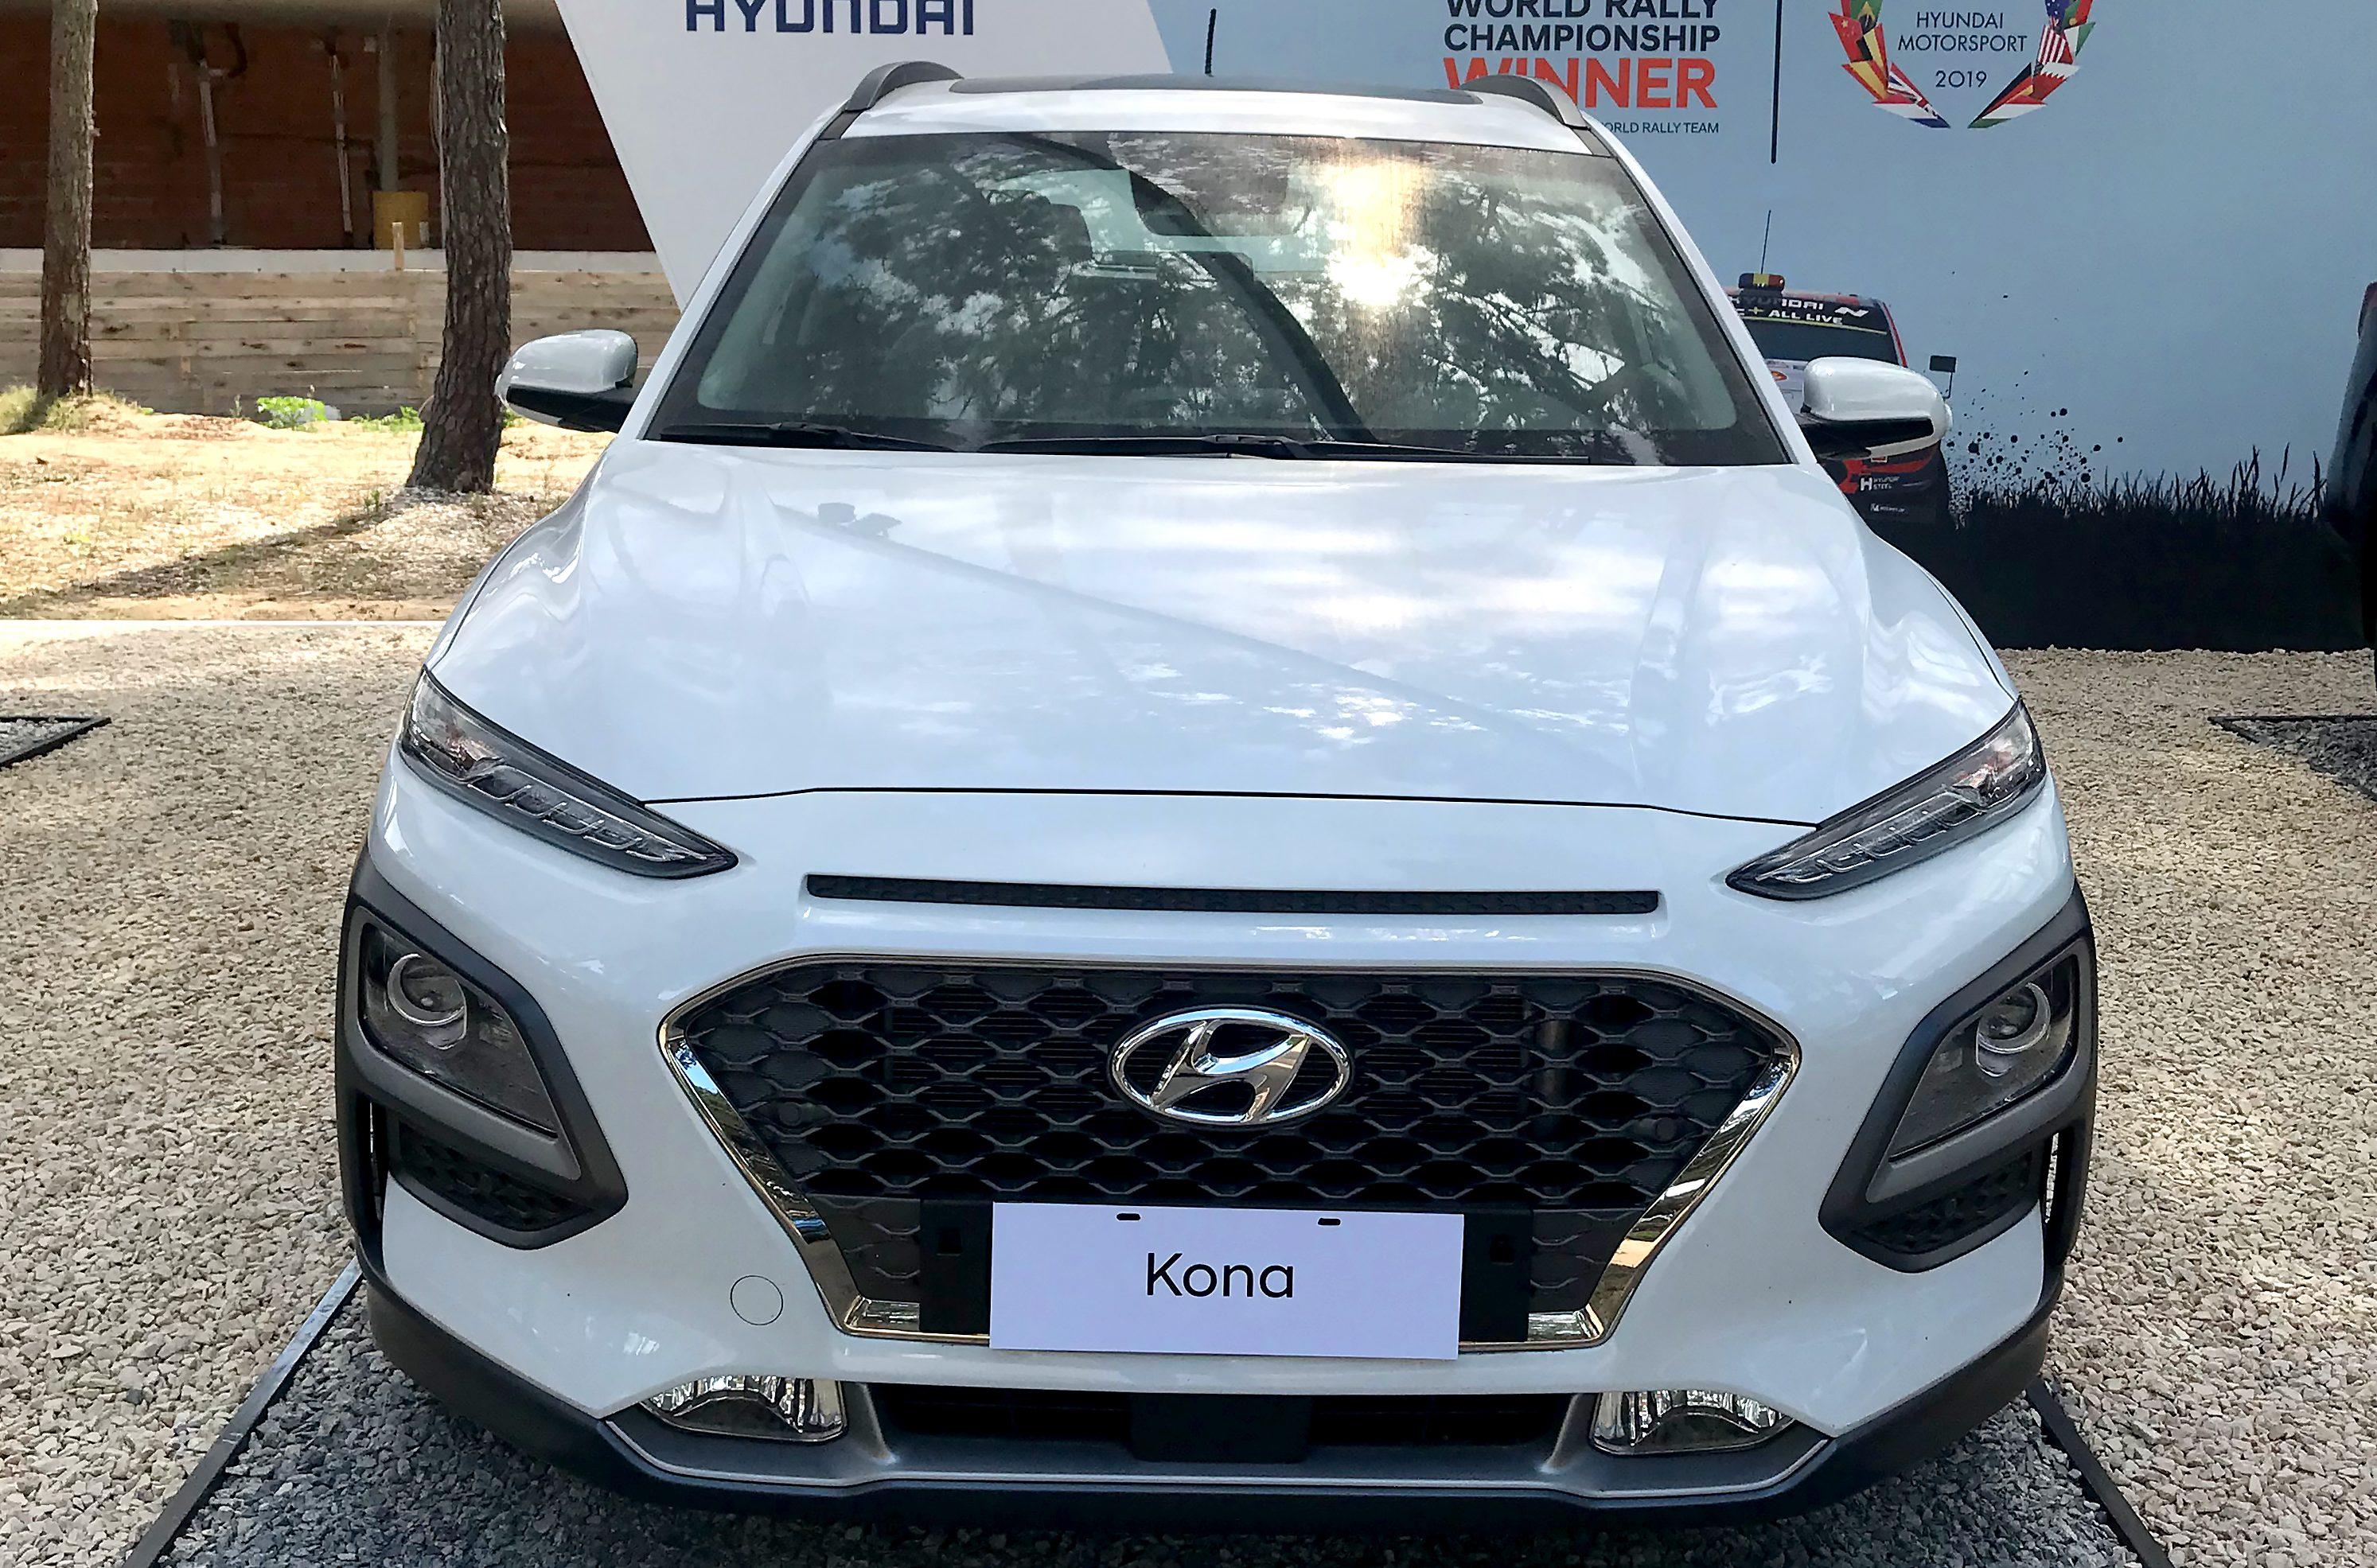 Hyundai Cariló Kona e1576858432631